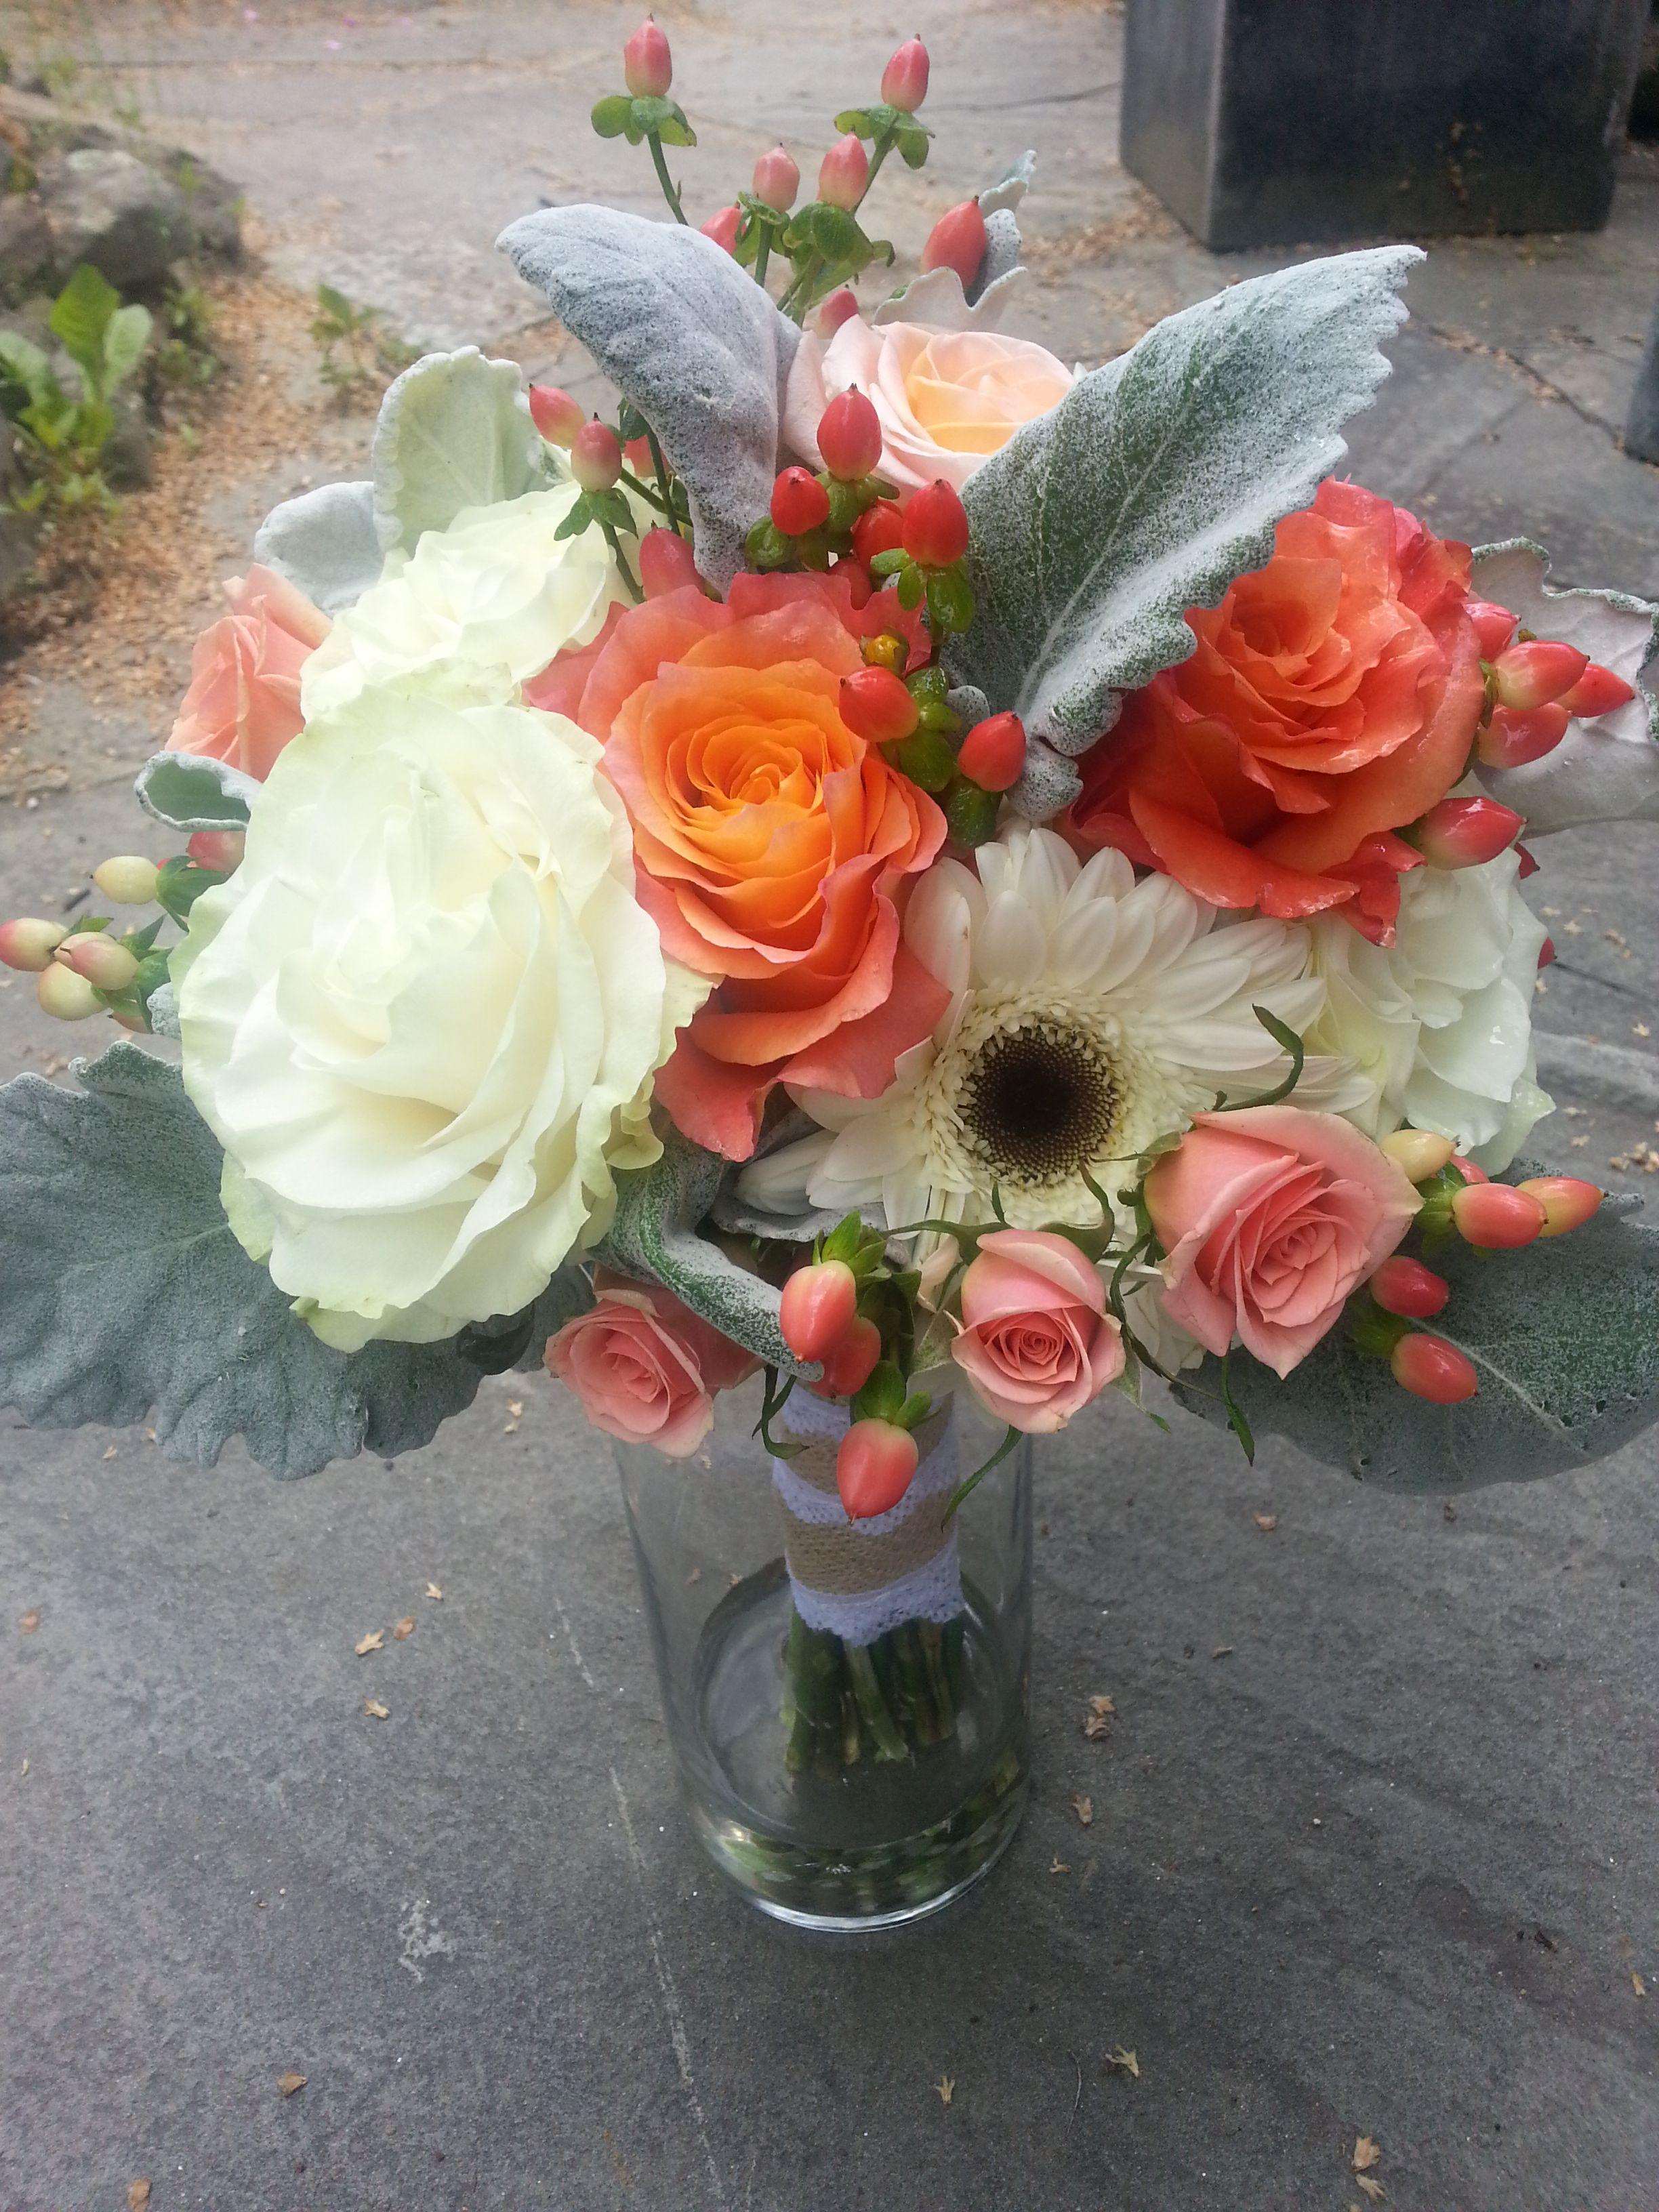 This bridal bouquet of Mondial roses, Free Spirit roses